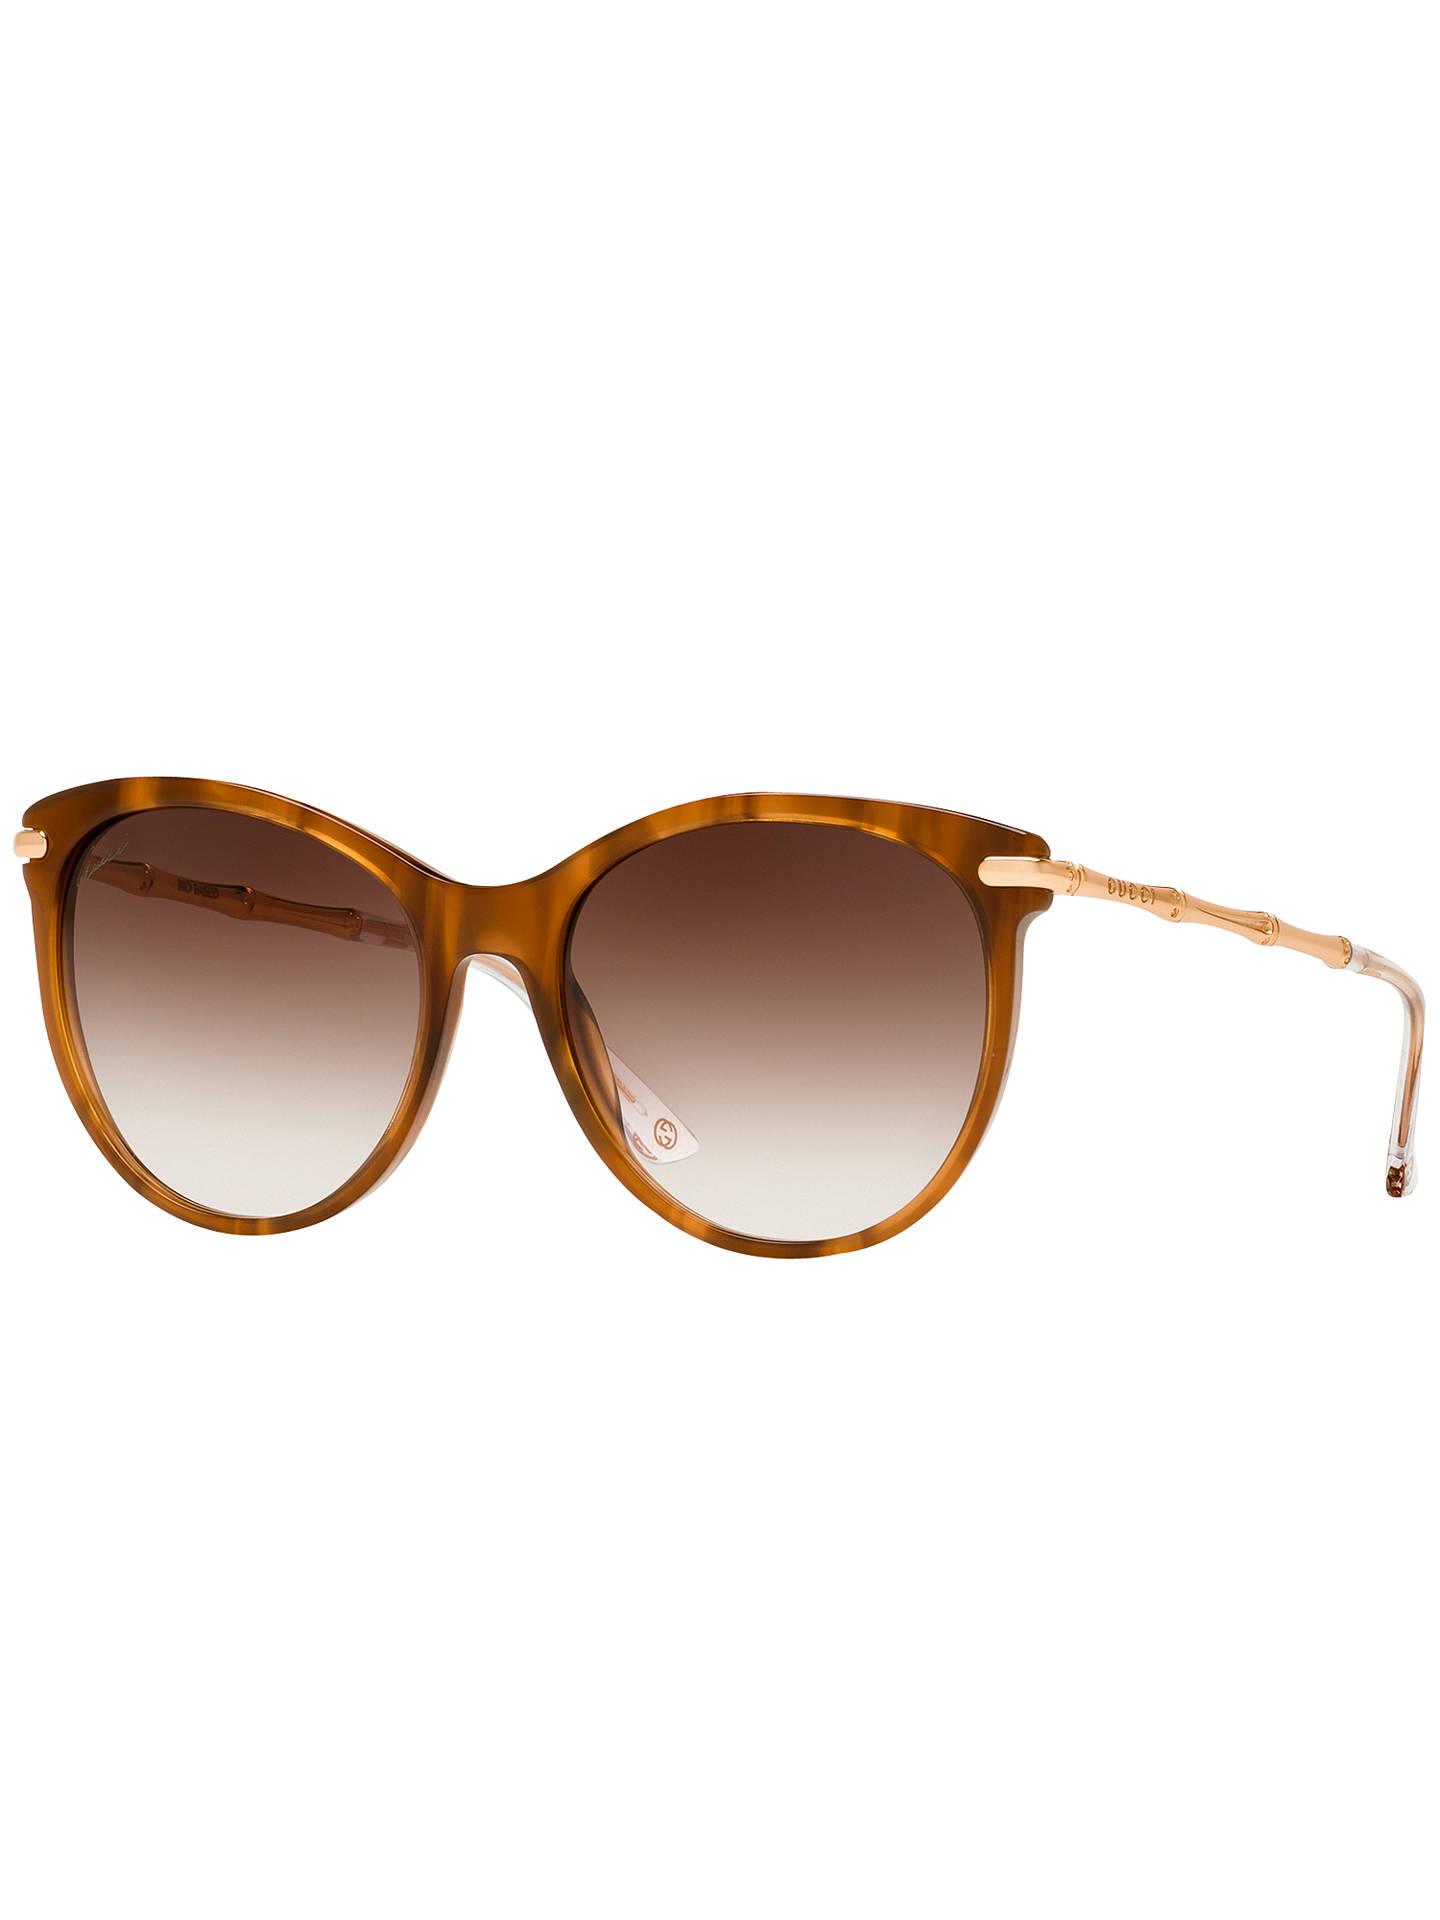 c8fa3e08ce BuyGucci GG3711 Cat s Eye Sunglasses